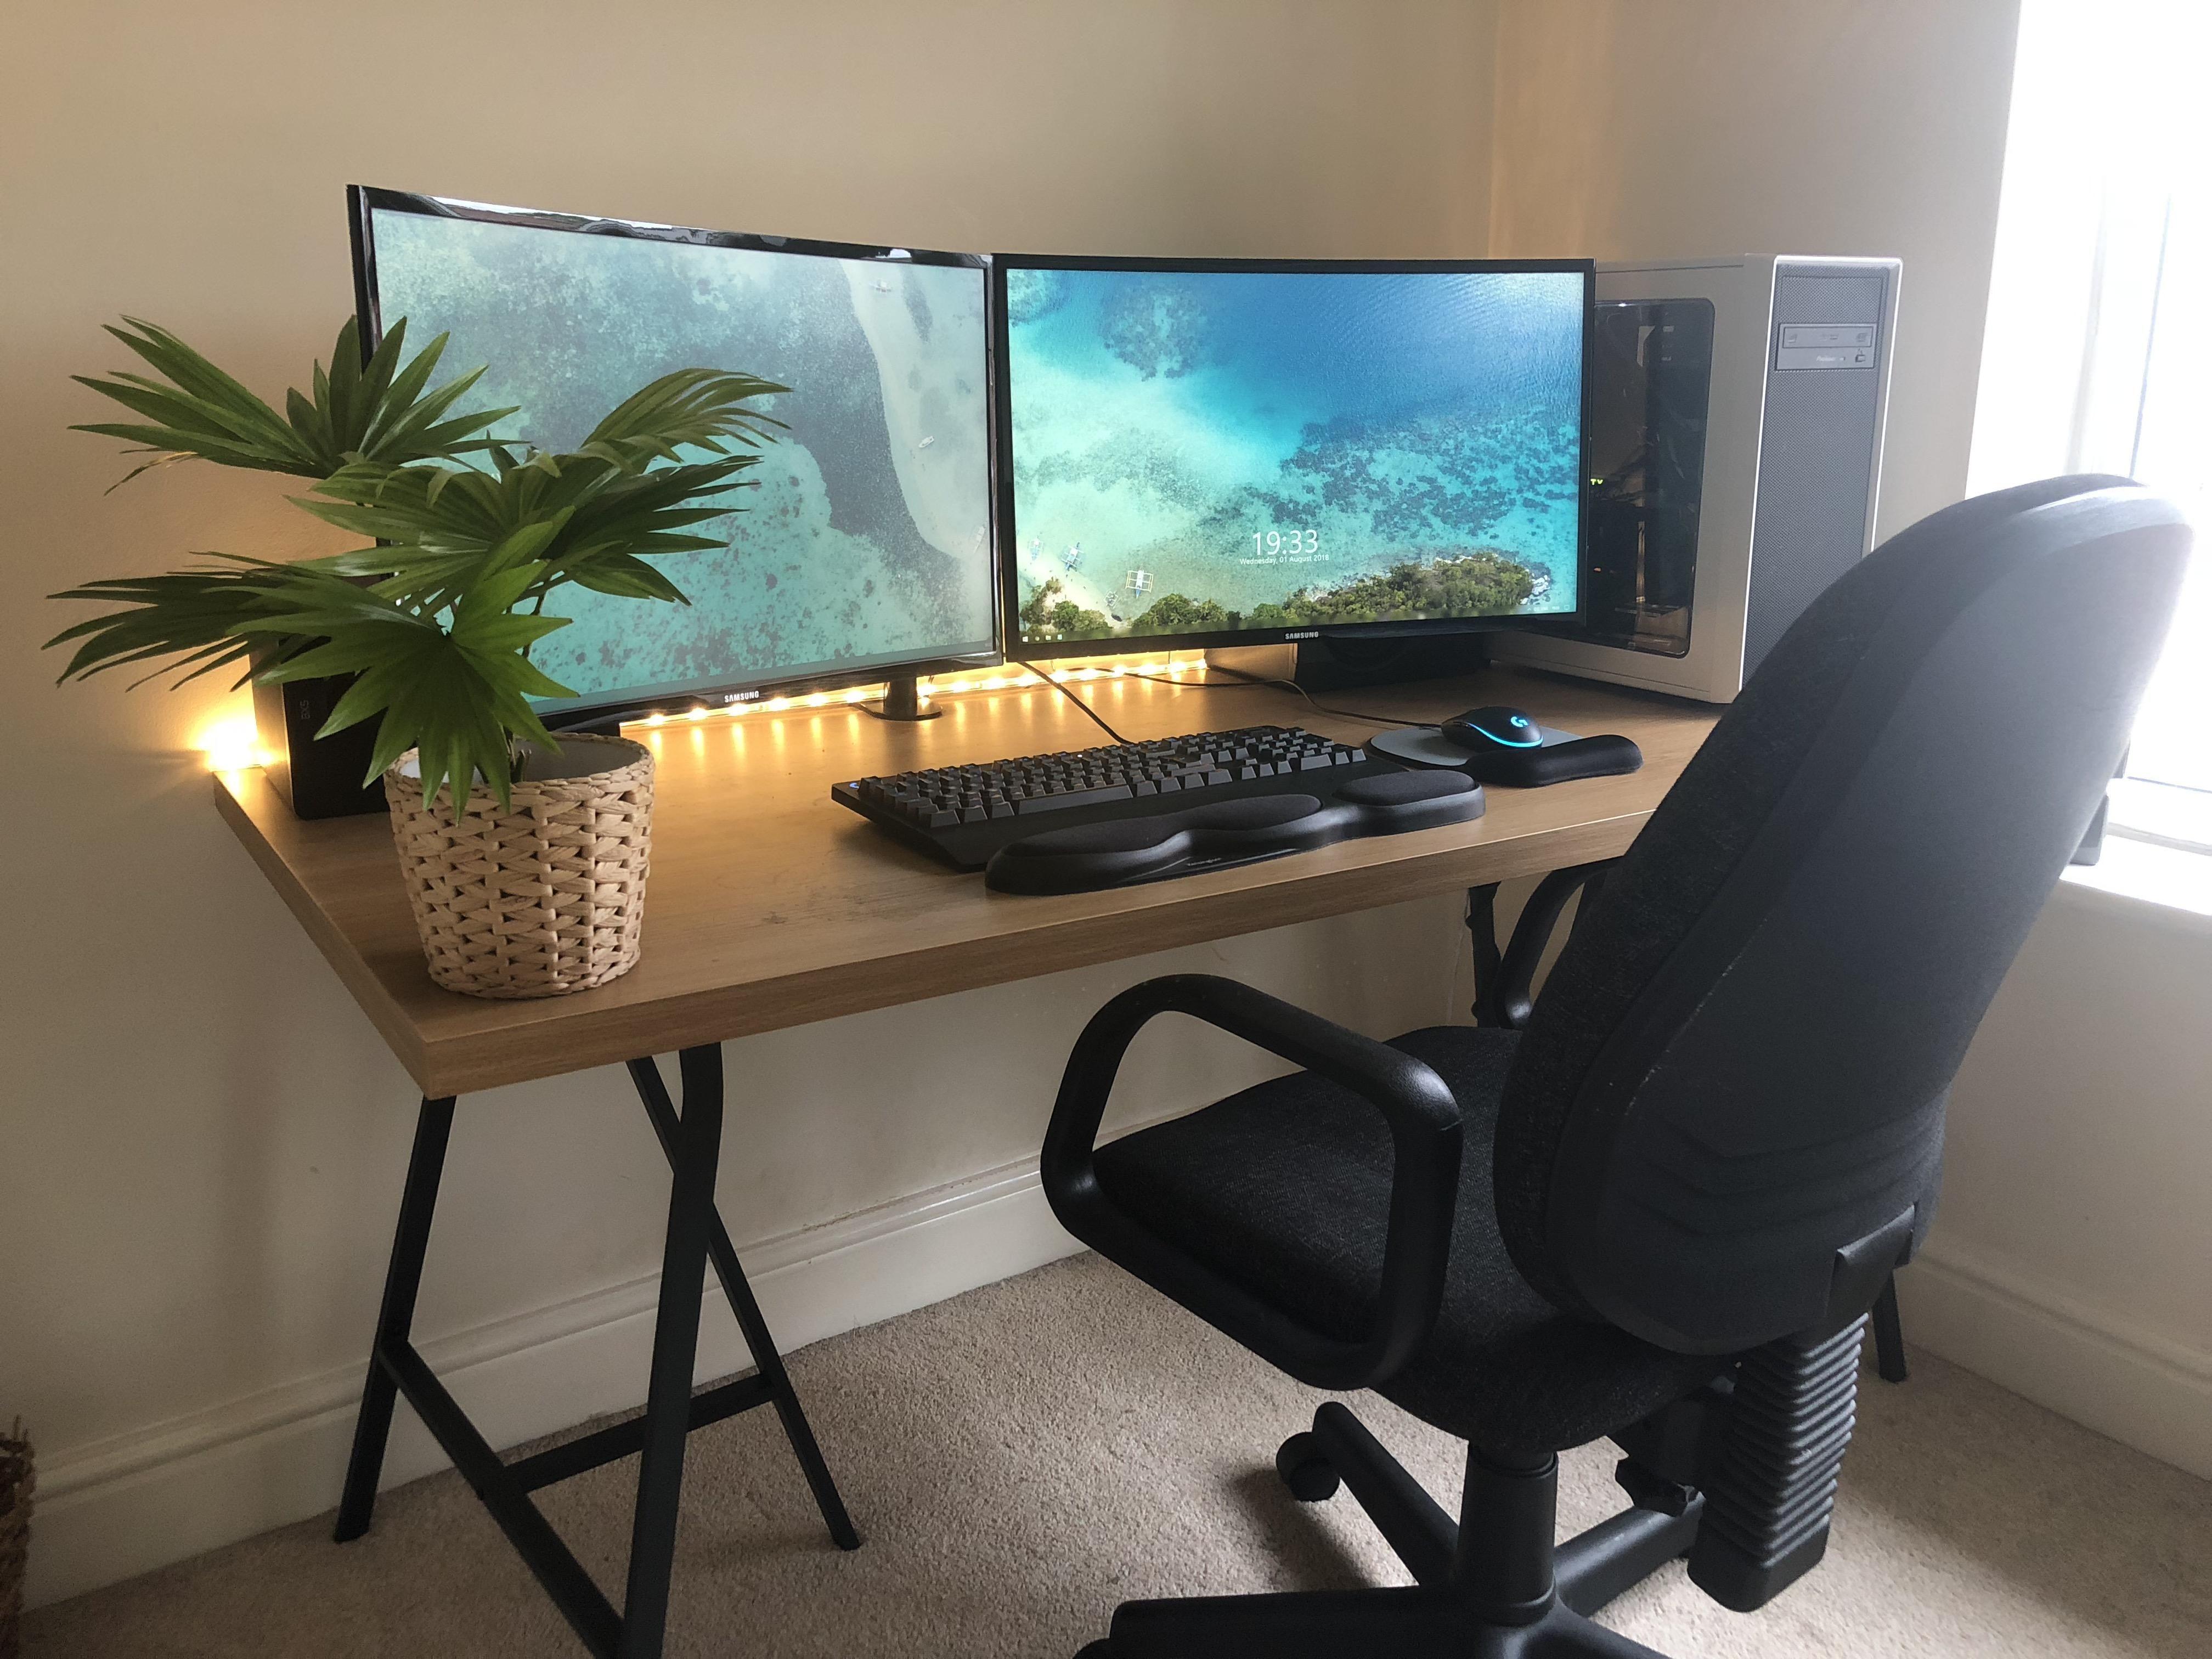 17 Outstanding Computer Desk Ideas Space Saving